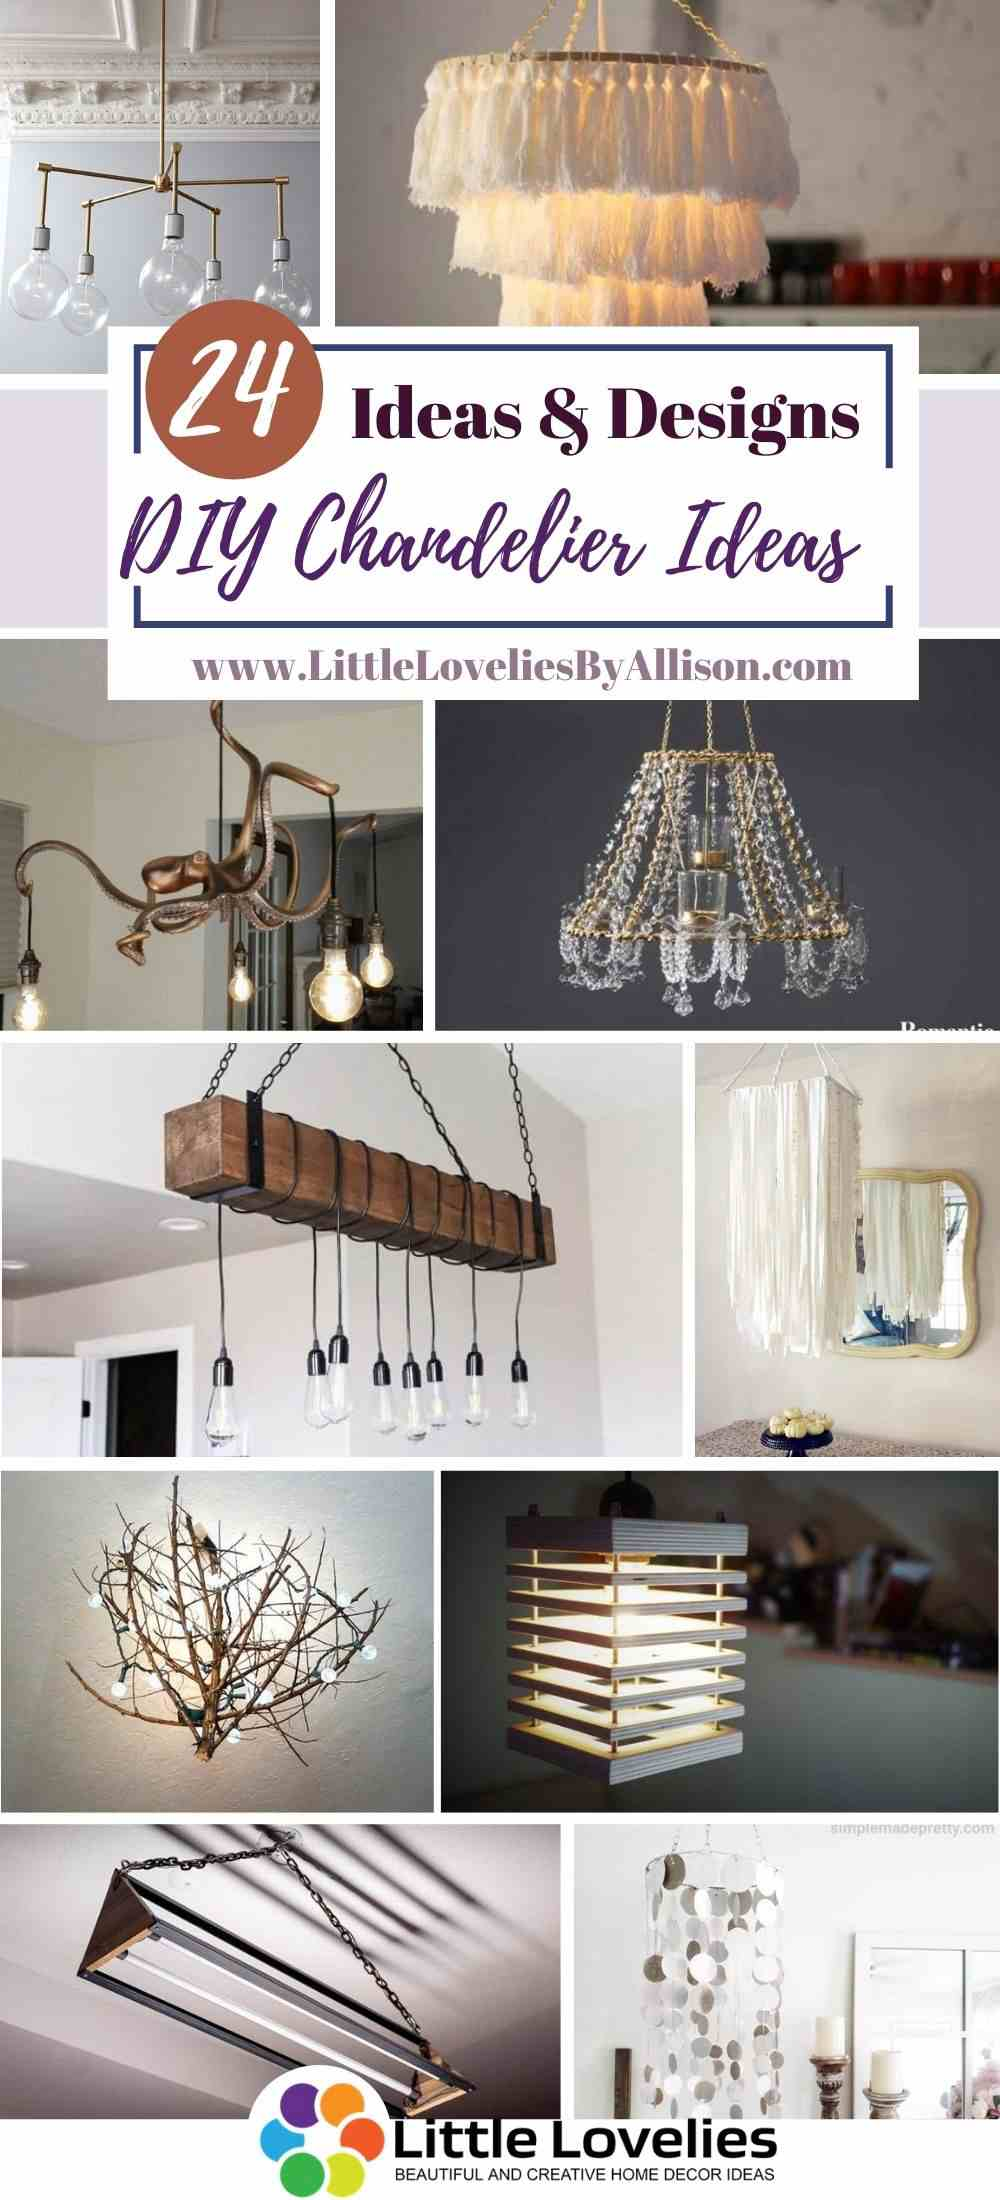 Best-Homemade-DIY-Chandelier-Ideas